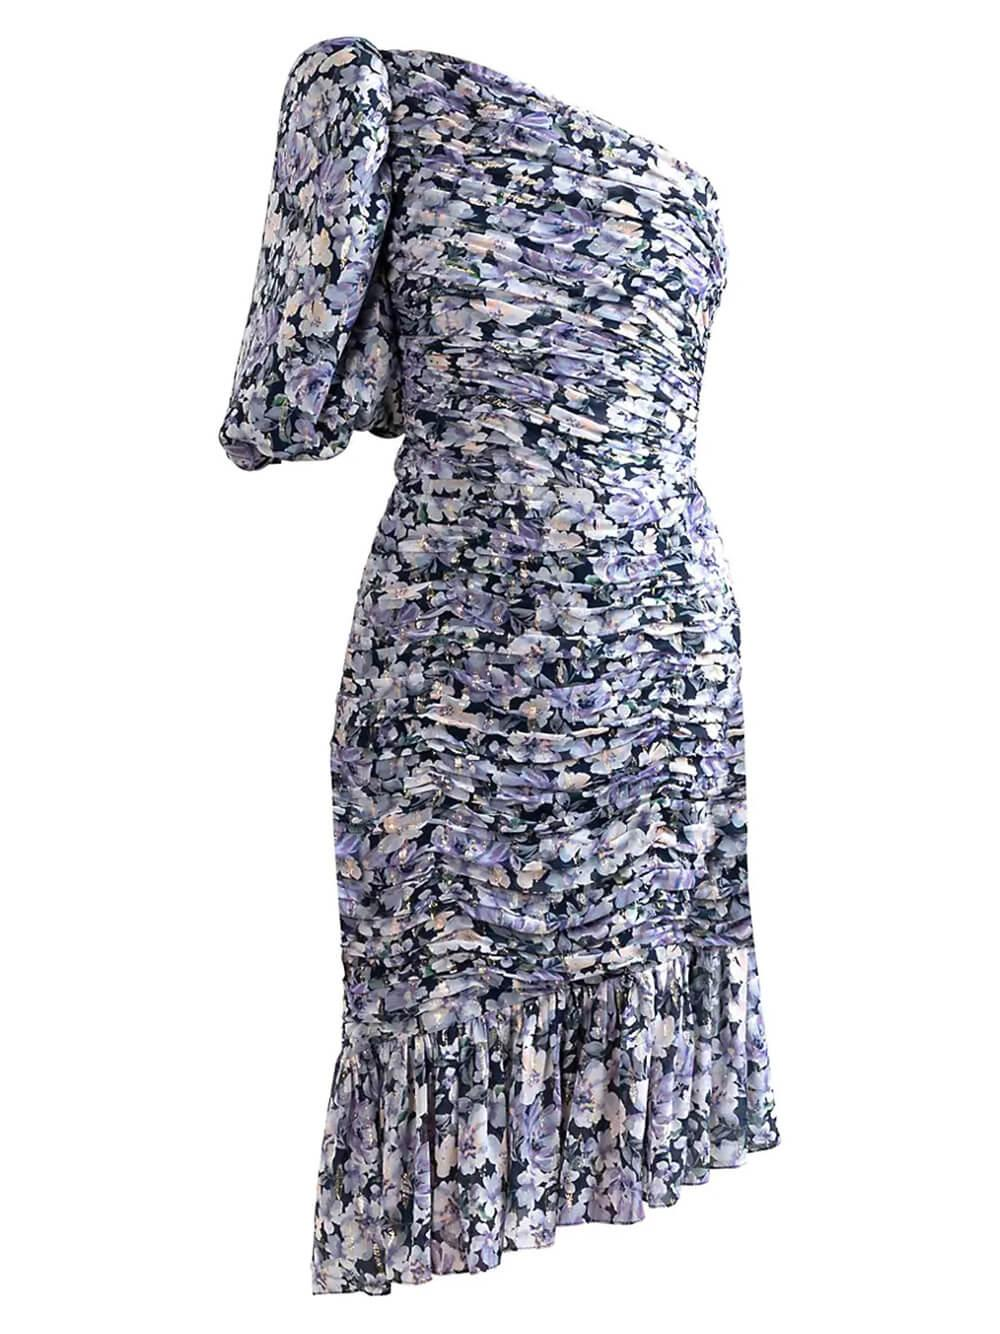 Highline Floral Mazie Dress Item # 6369118